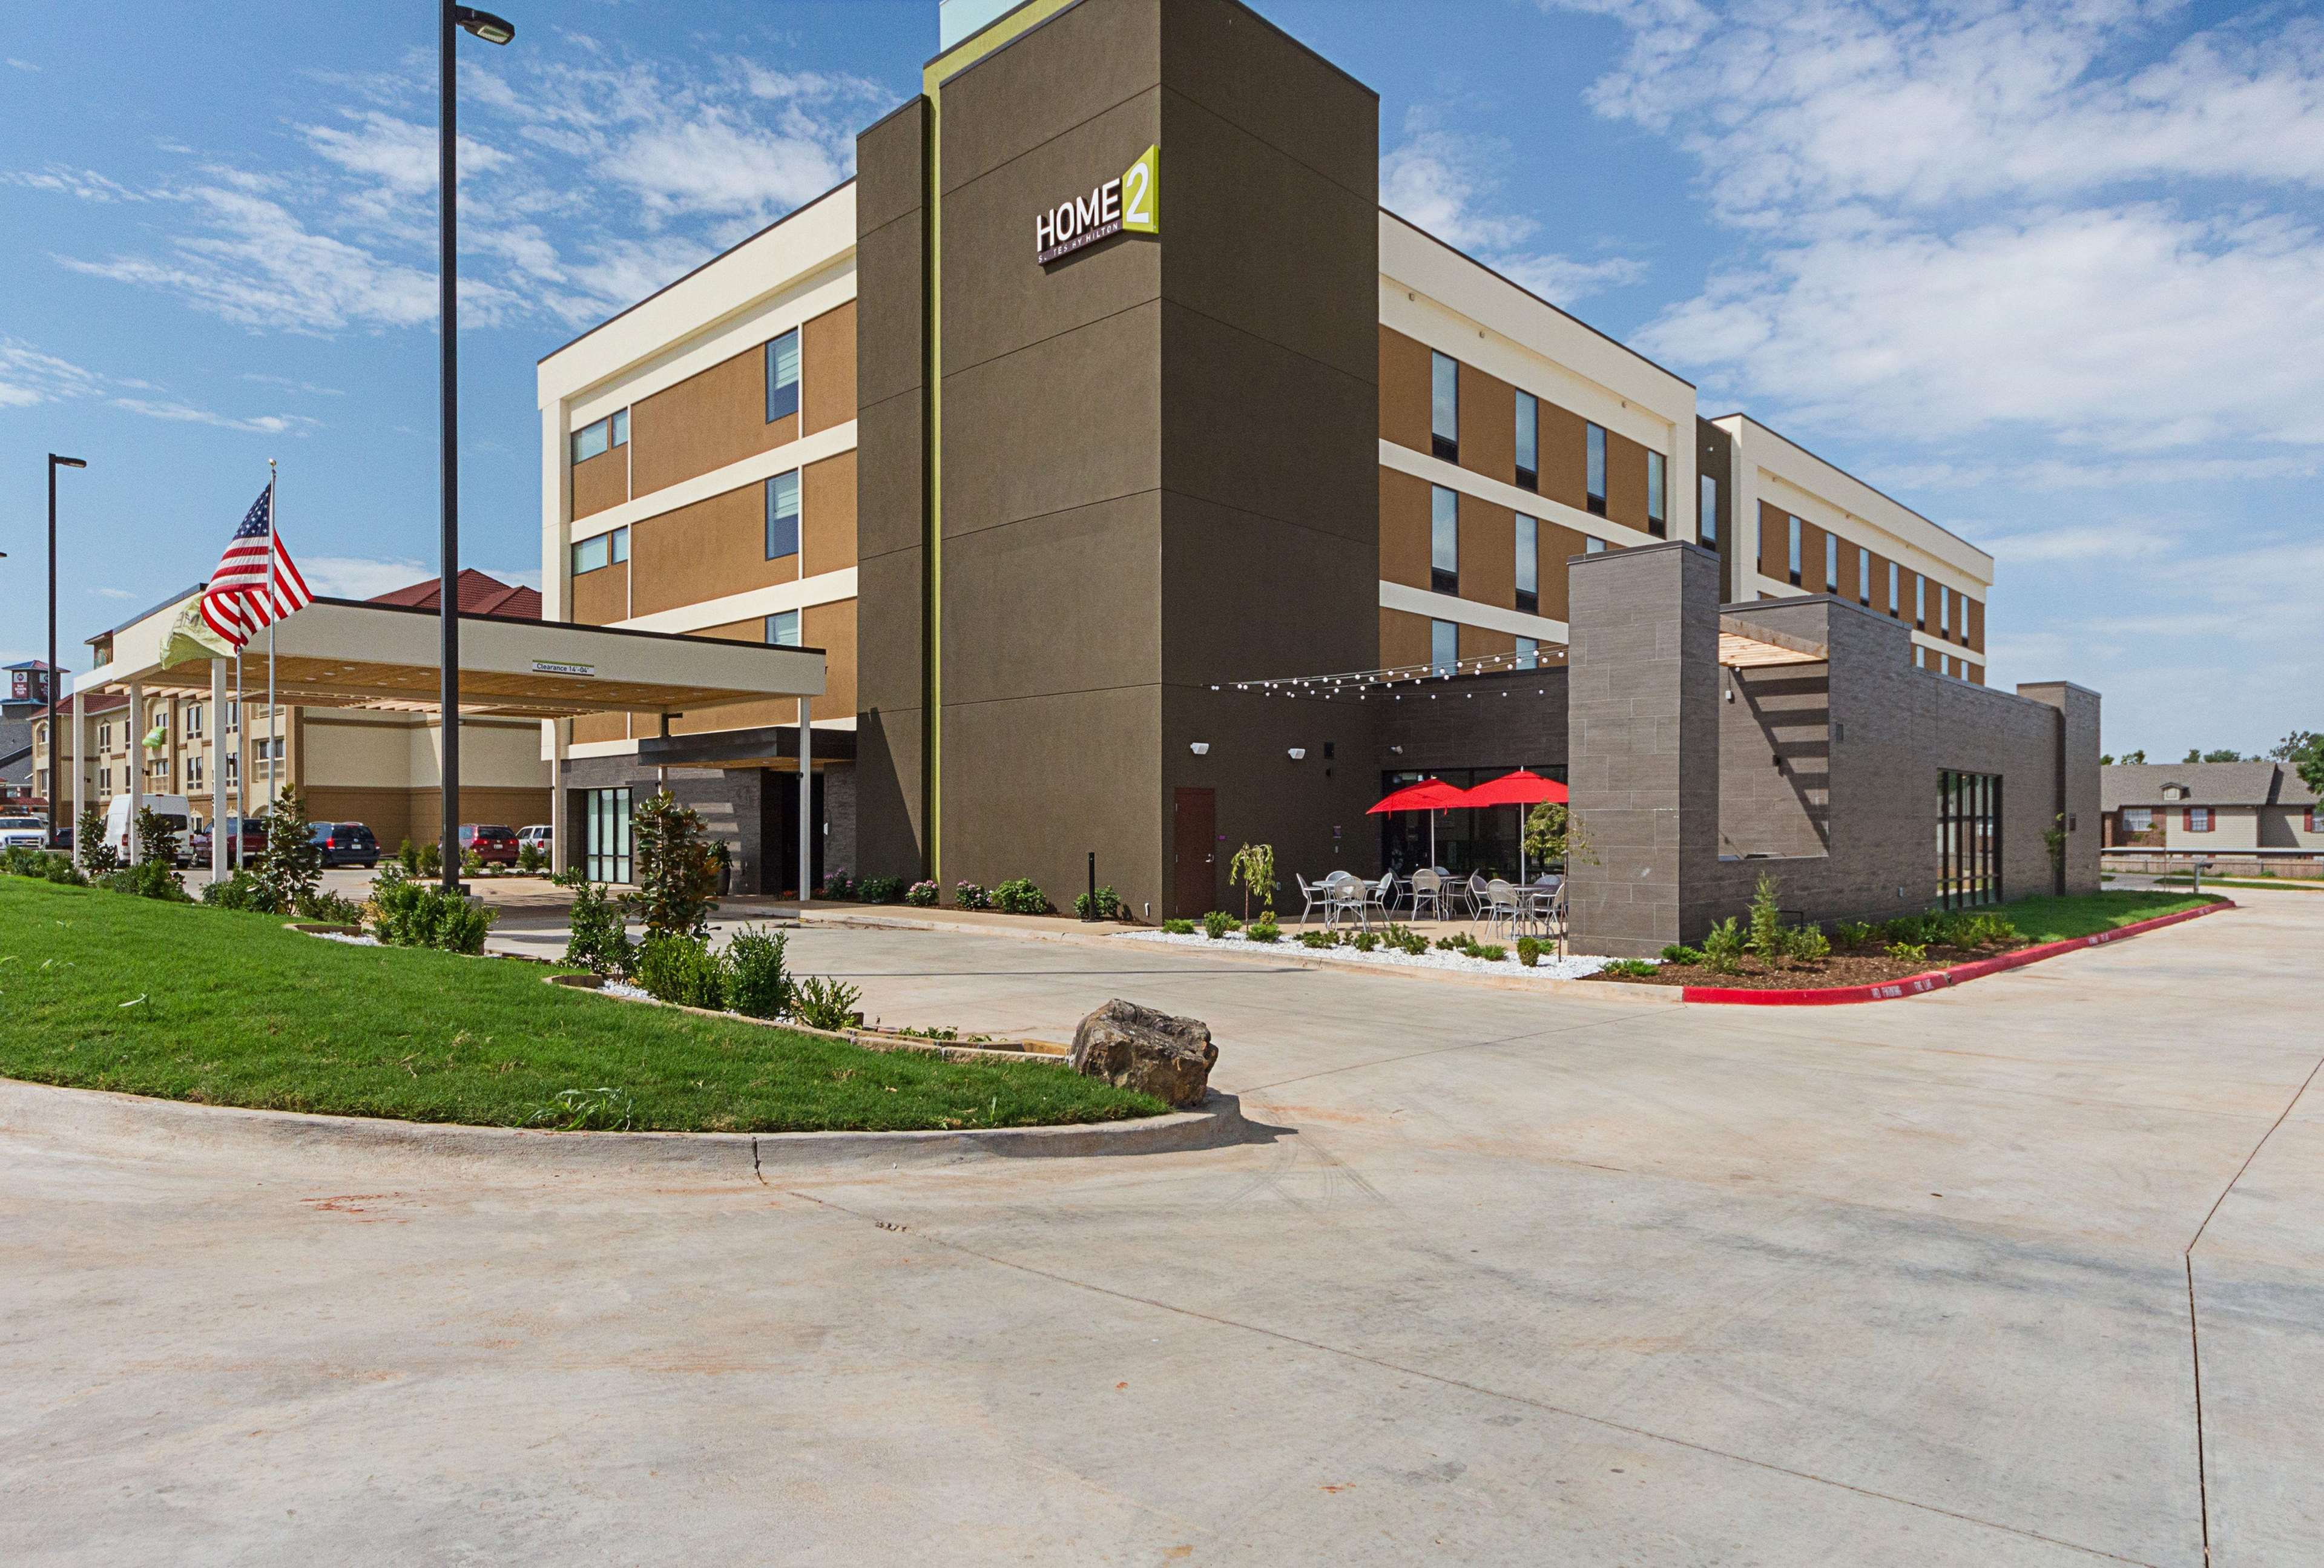 Home 2 Suites by Hilton - Yukon image 0